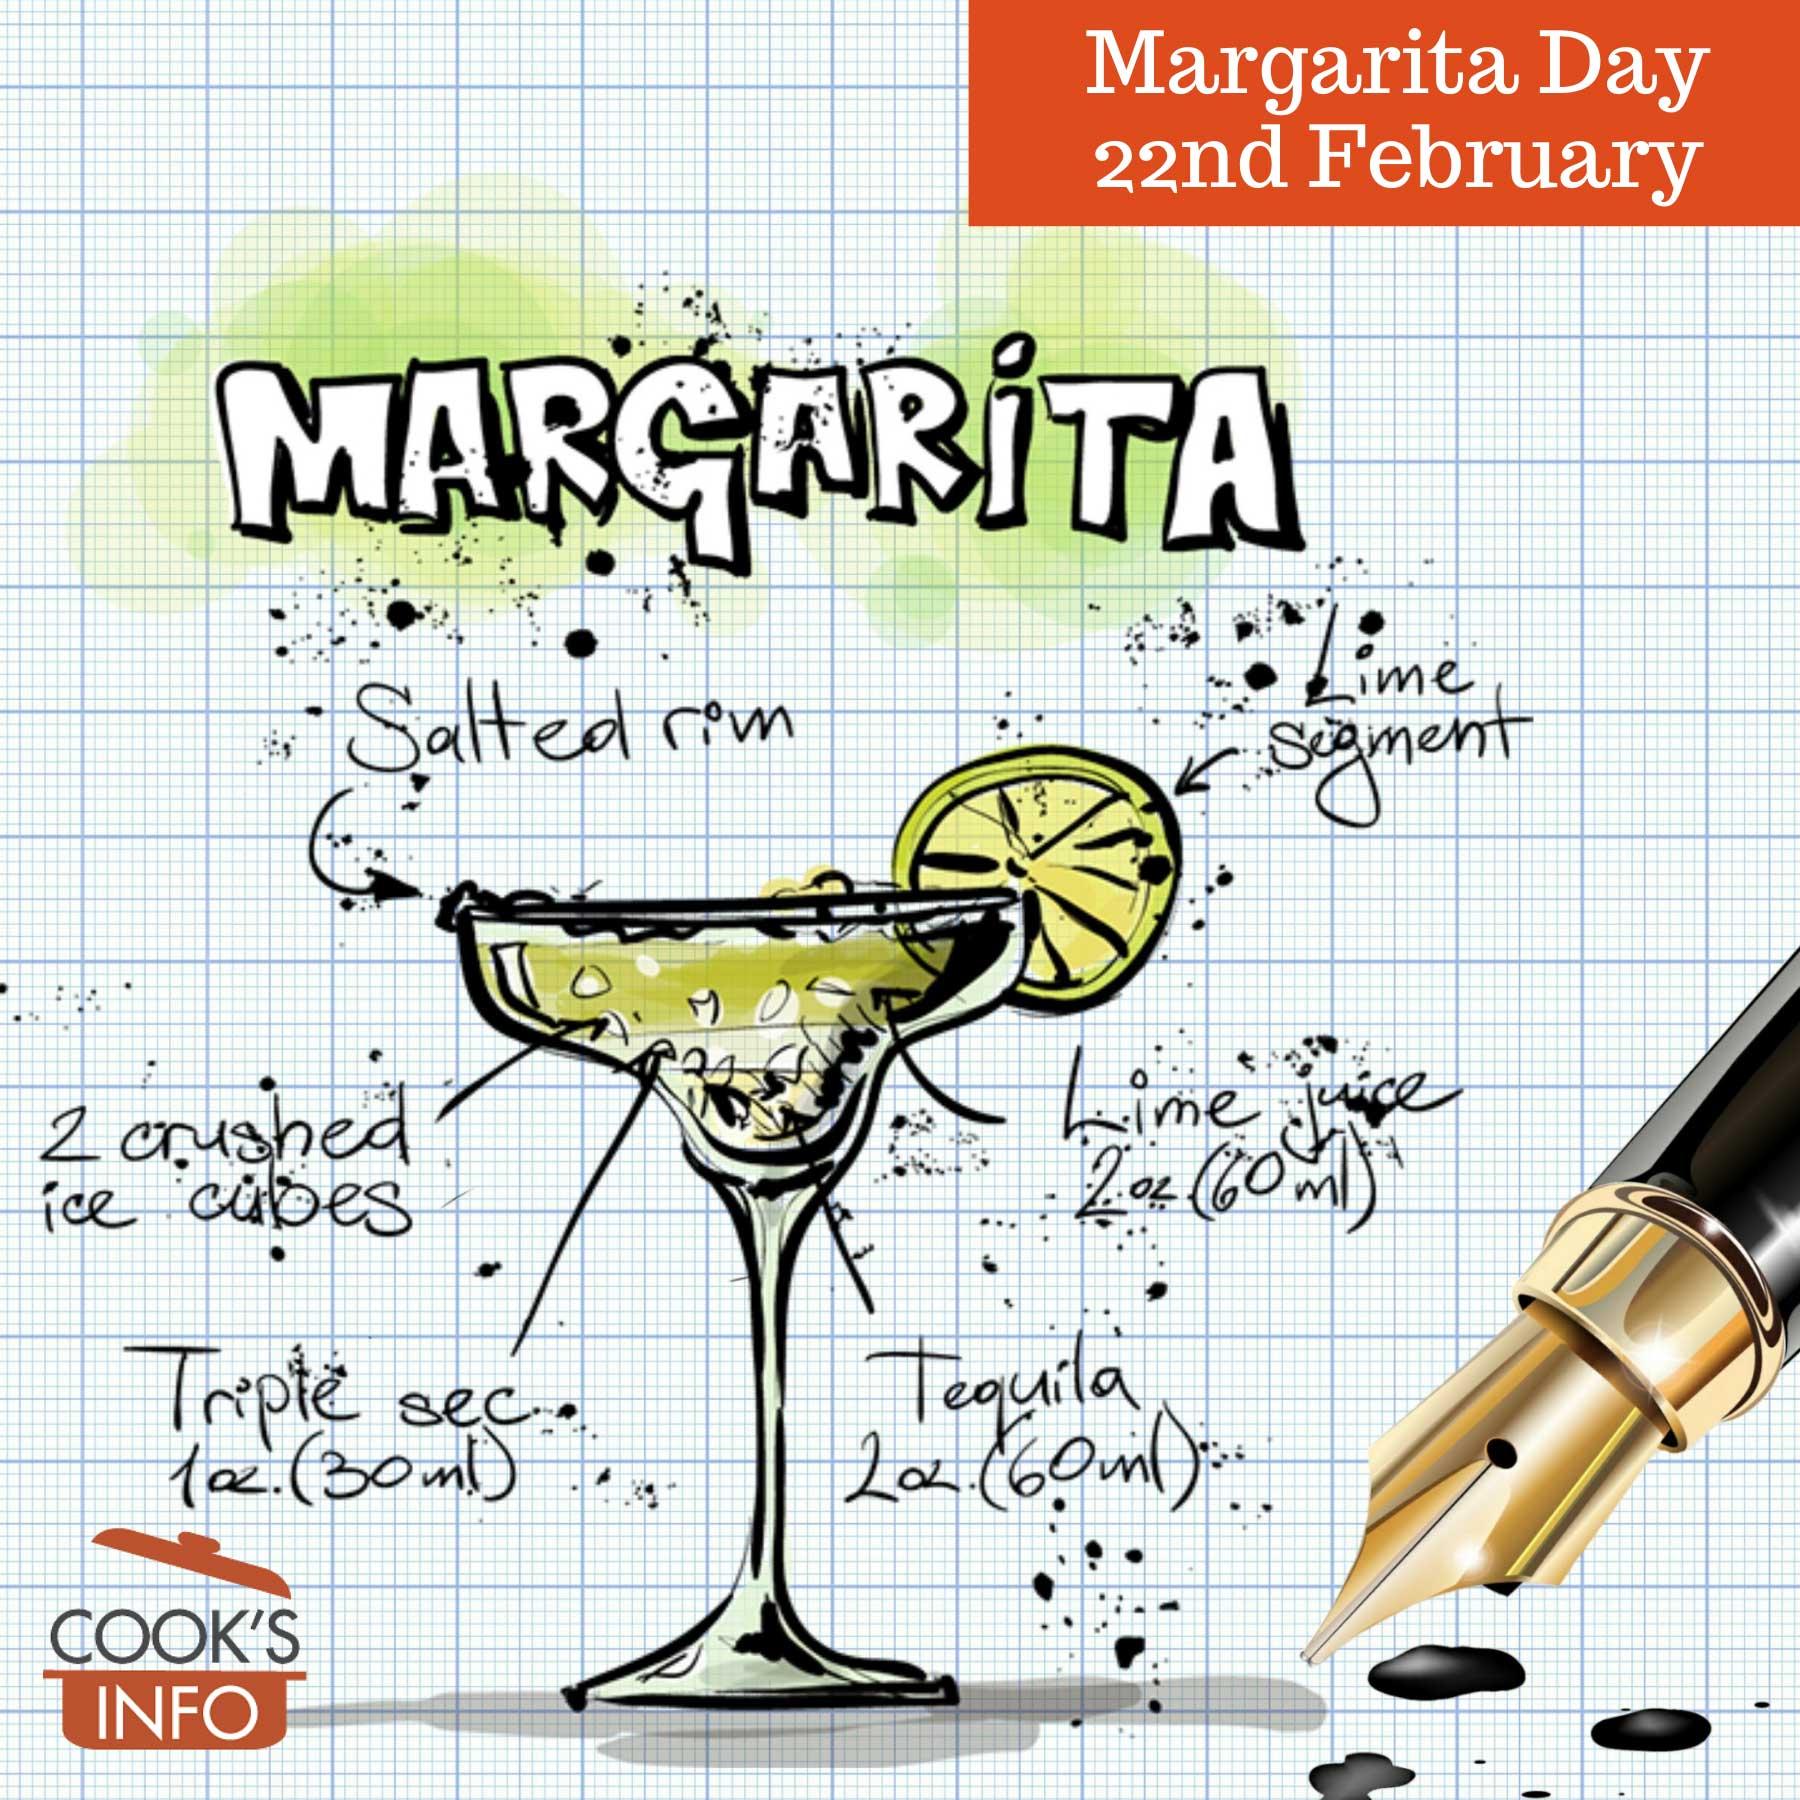 Margarita glass and recipe